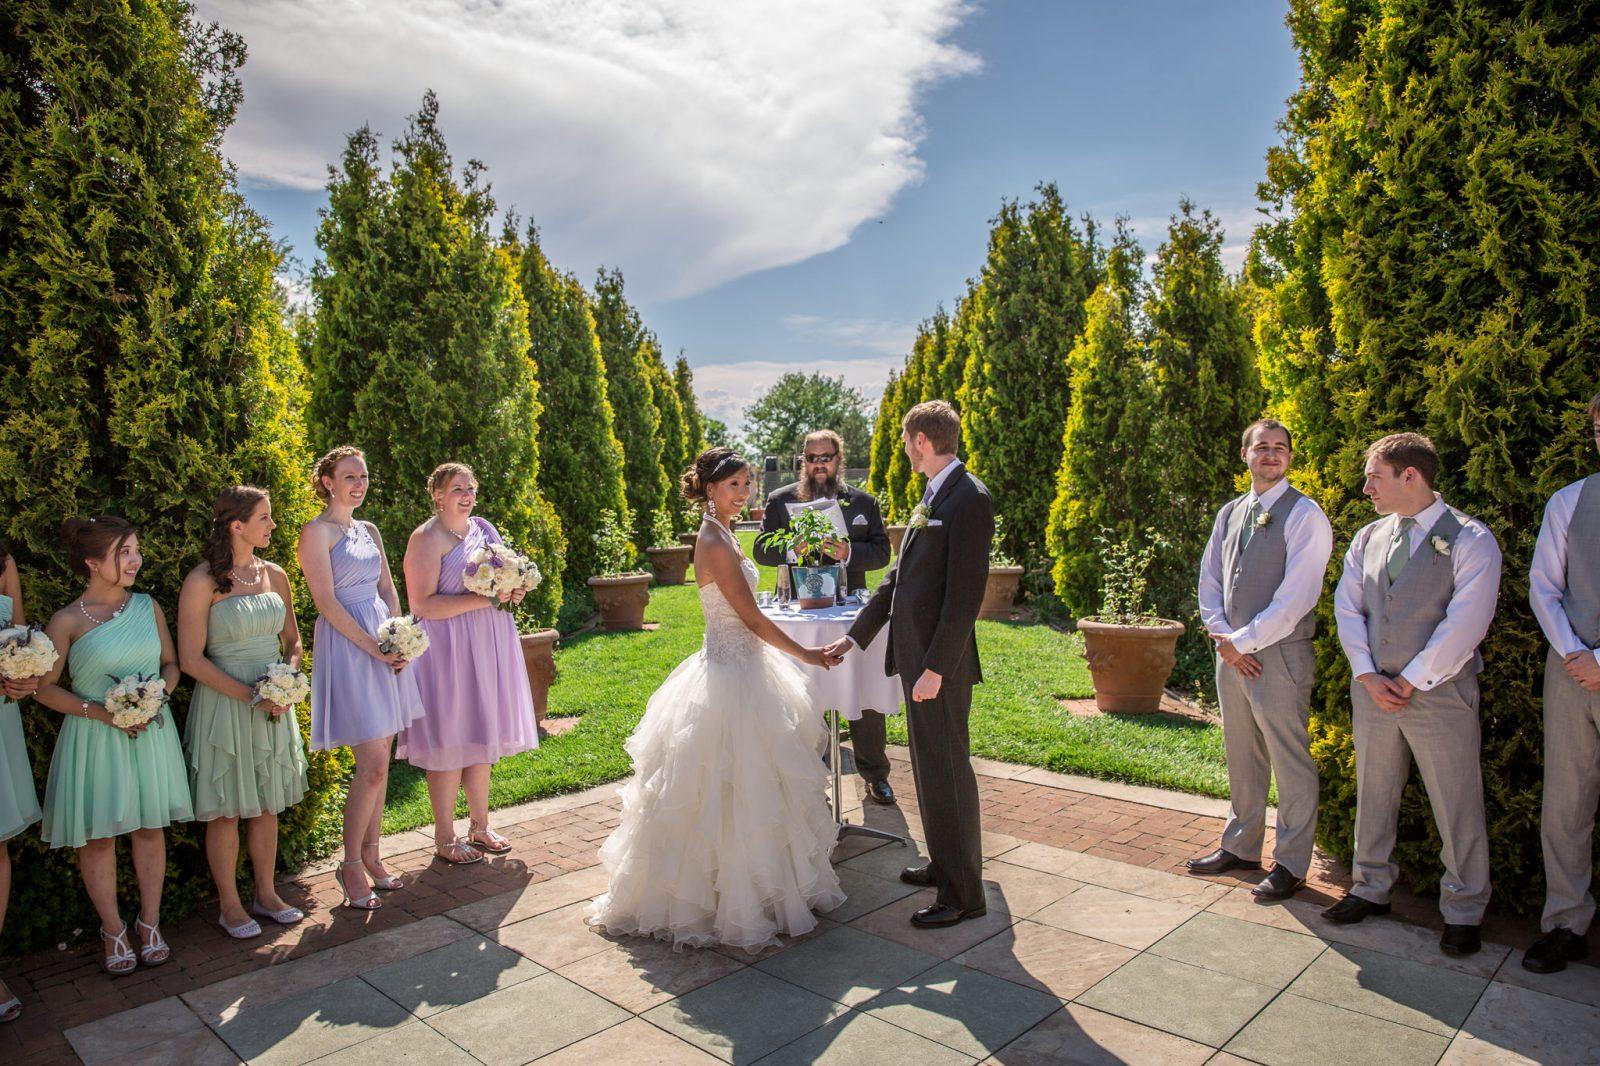 Denver Botanic Gardens Wedding Ceremony